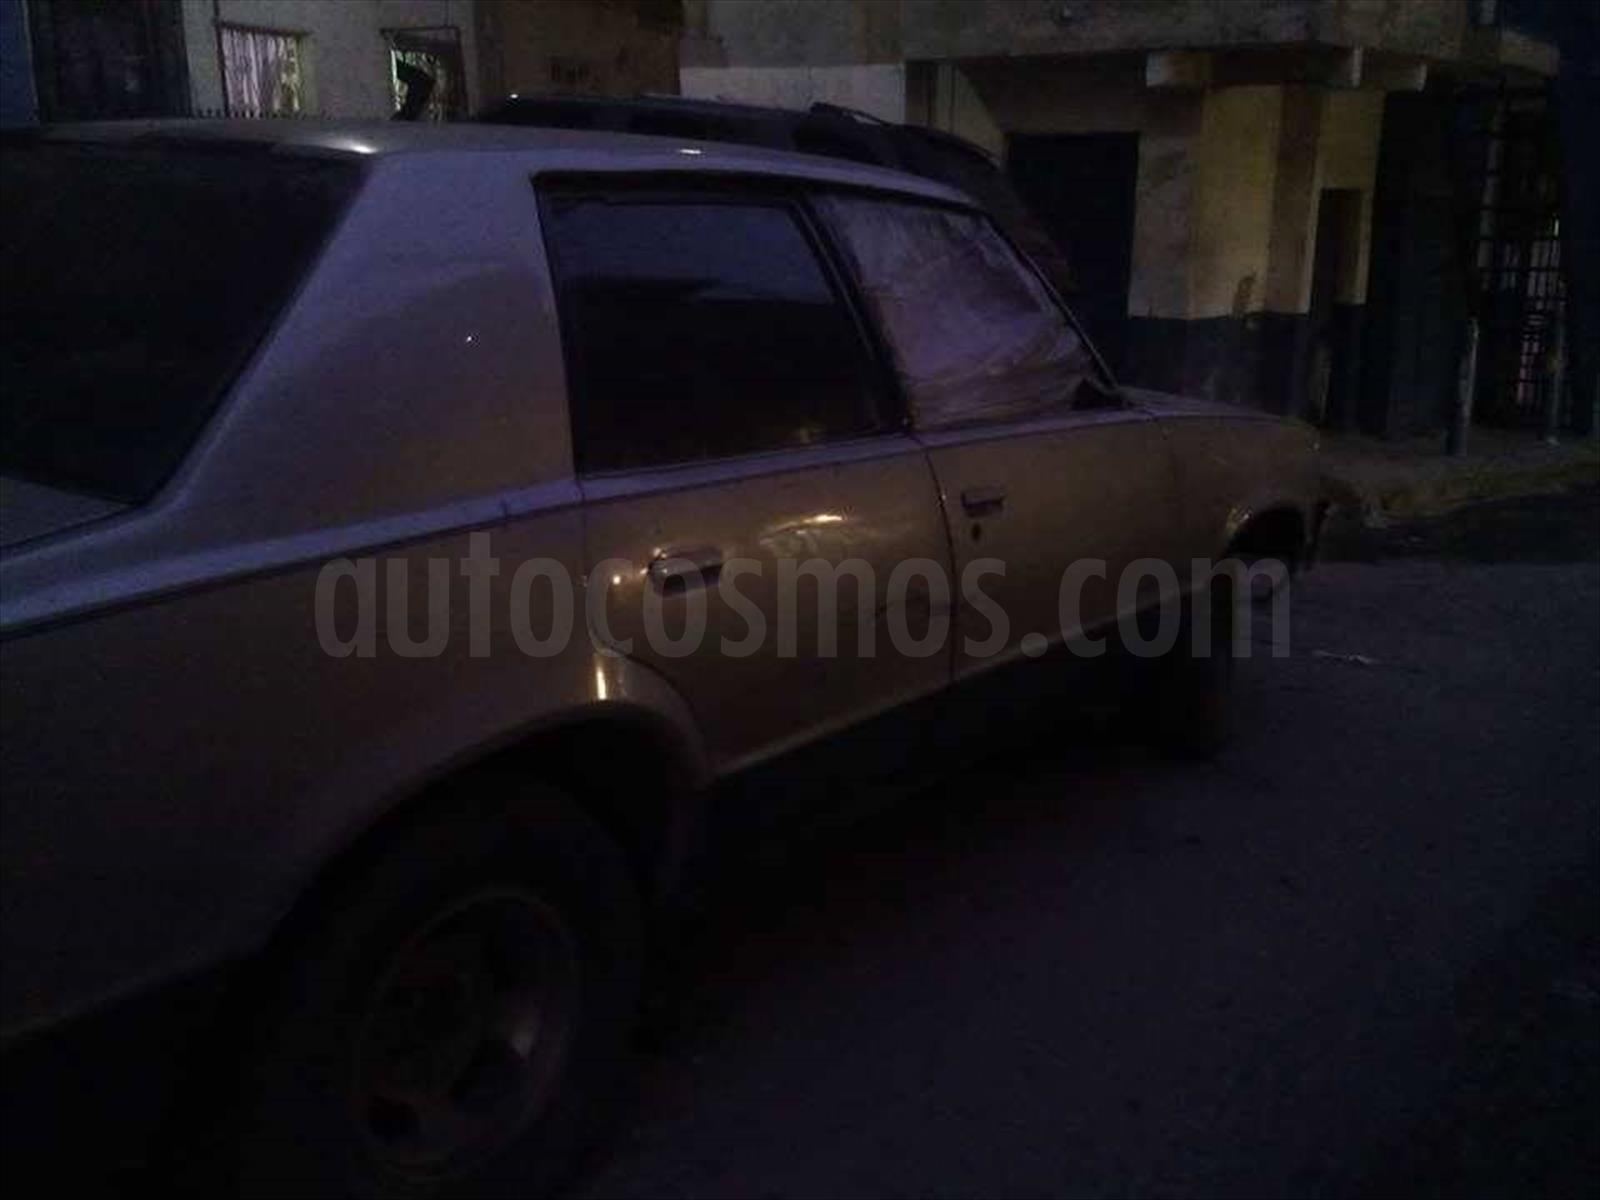 Venta carros usado - Distrito Capital - Chevrolet Malibu 8